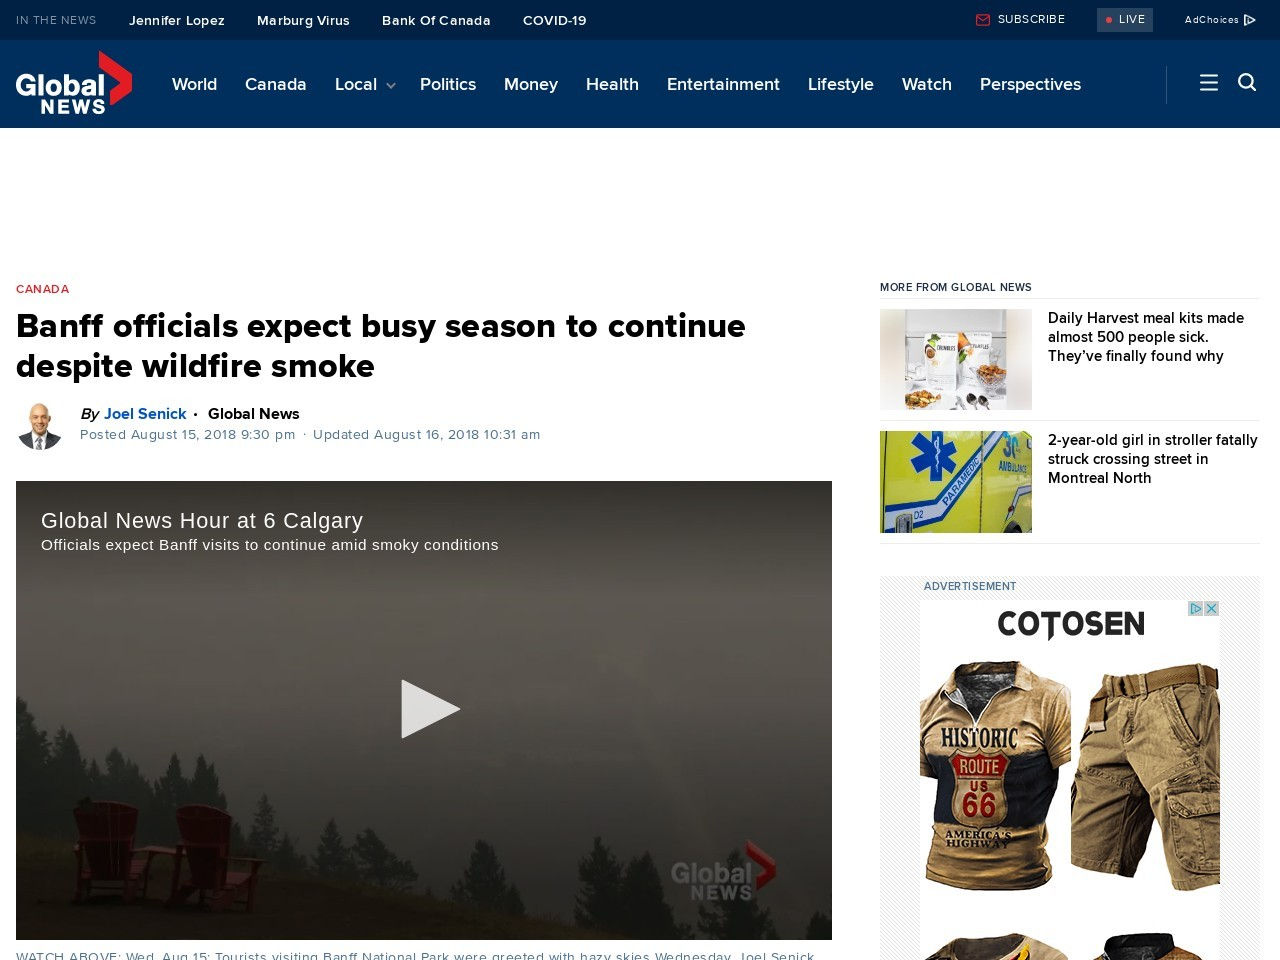 Banff officials expect busy season to continue despite wildfire smoke